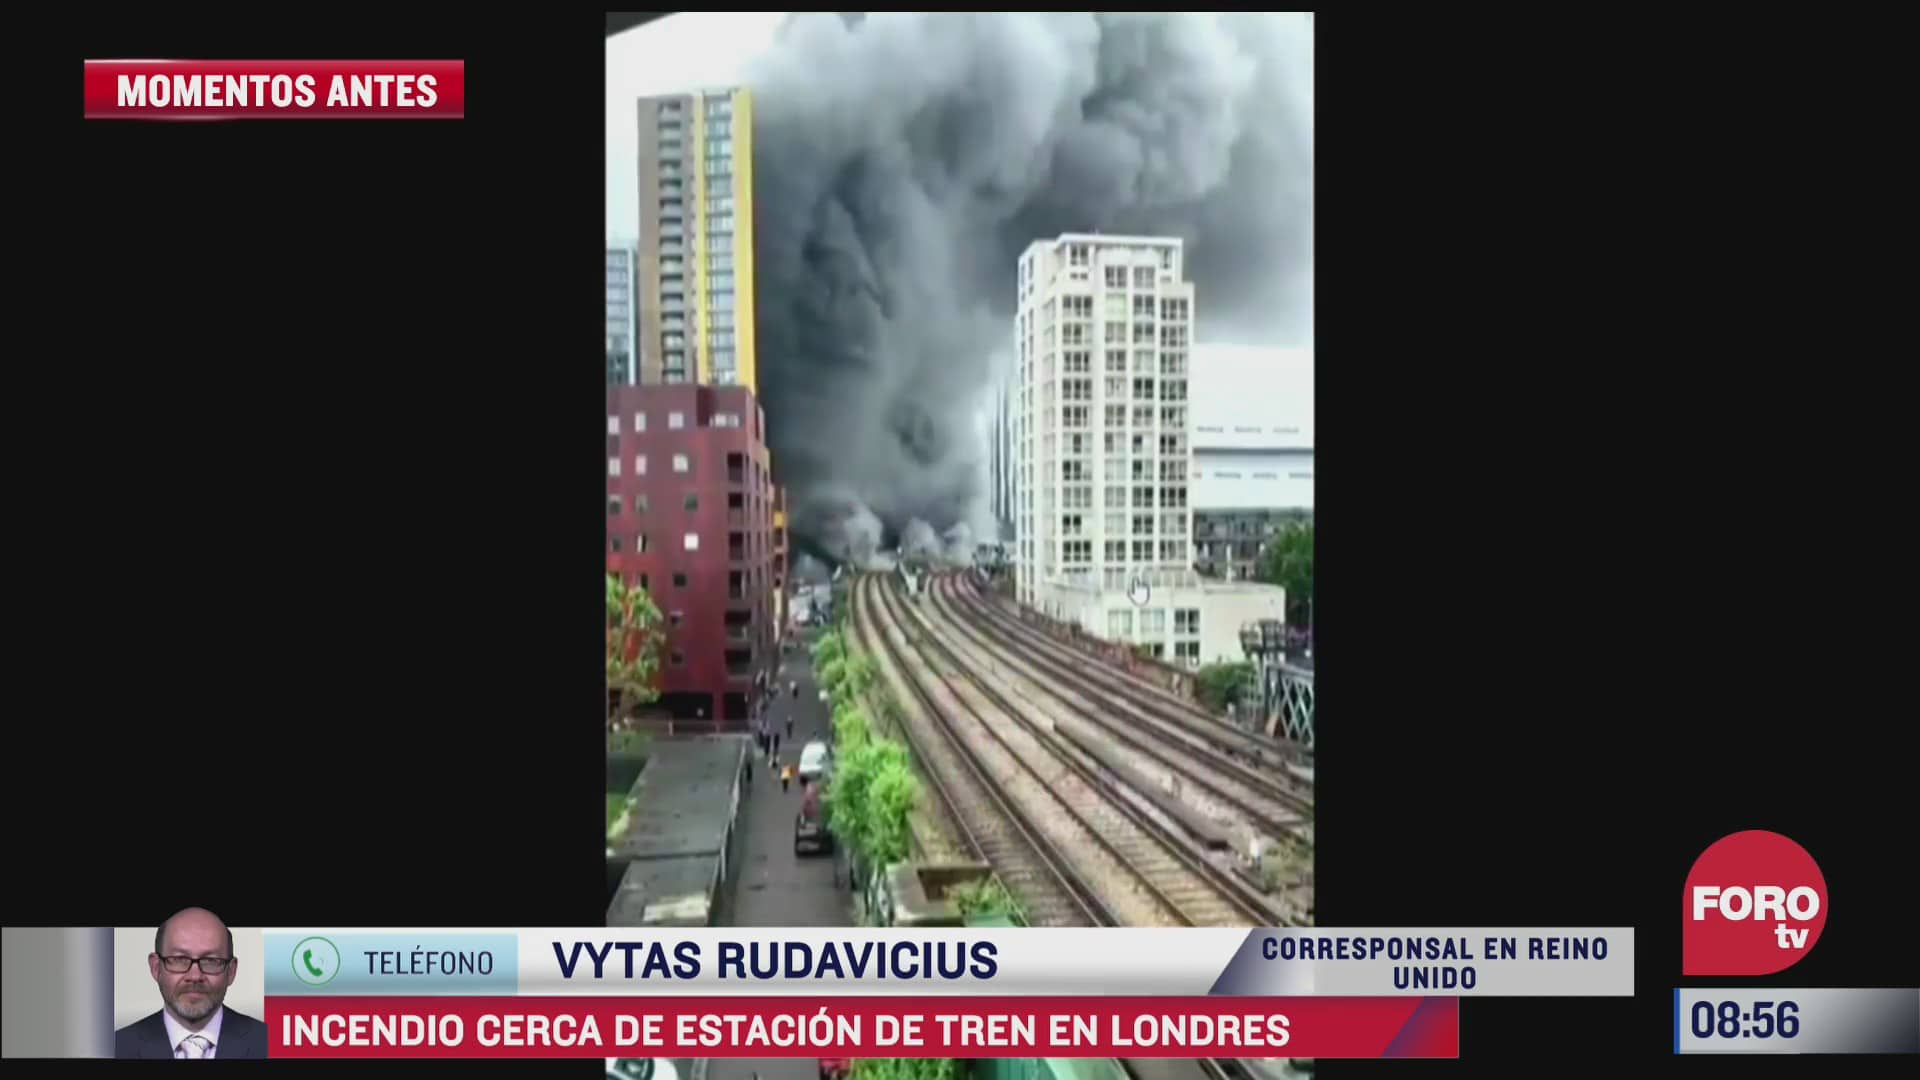 se registra fuerte incendio cerca de estacion de tren en londres